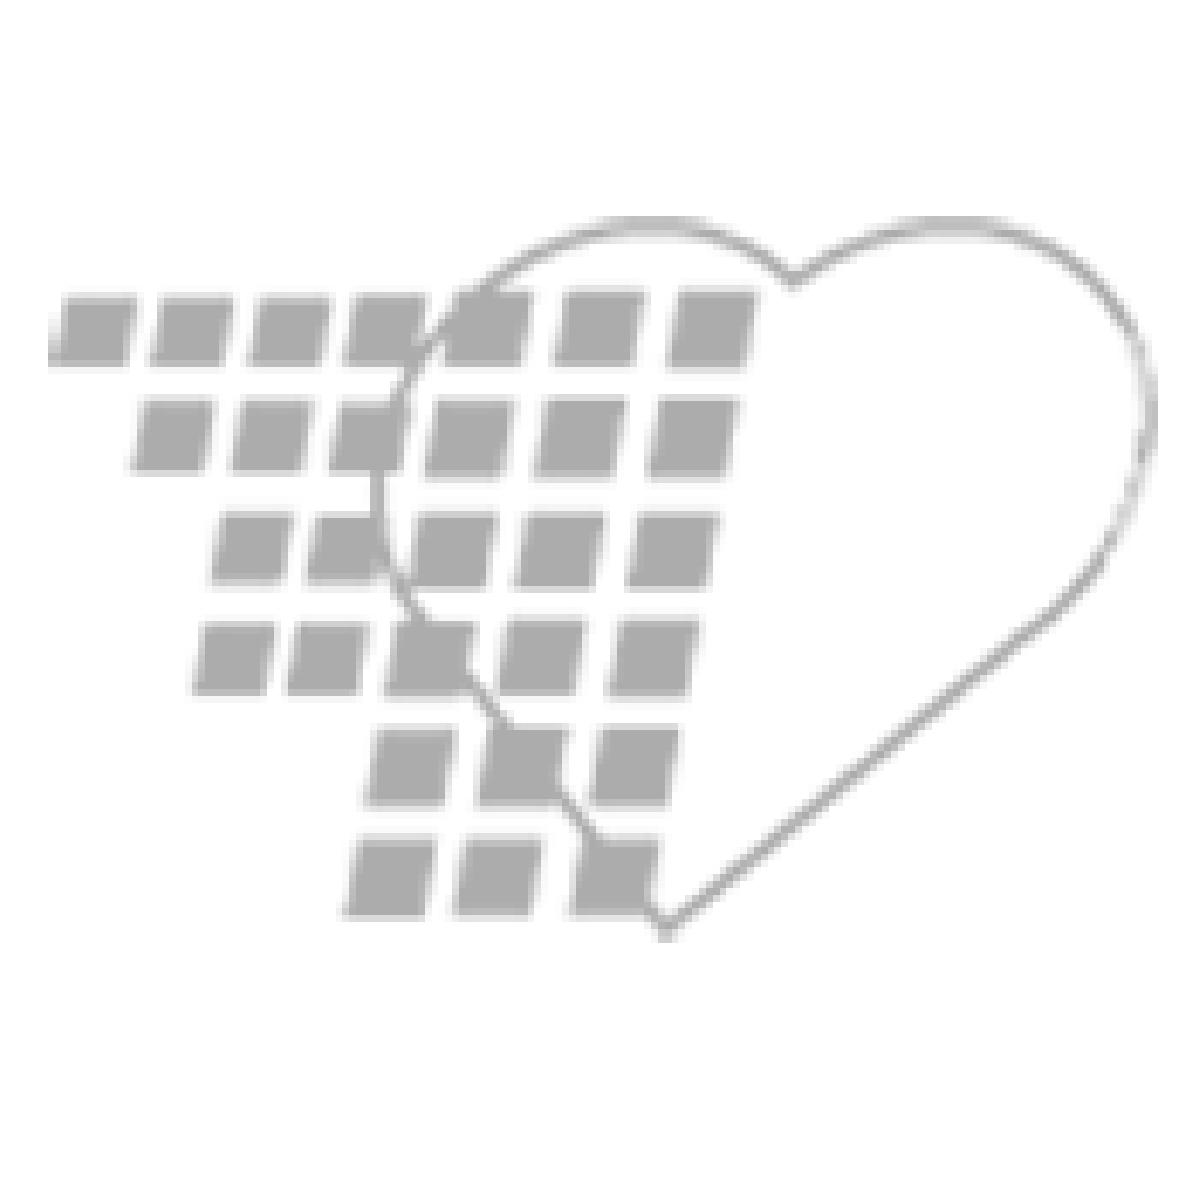 06-82-4142 Venipuncture Needle-Pro Safety Holder